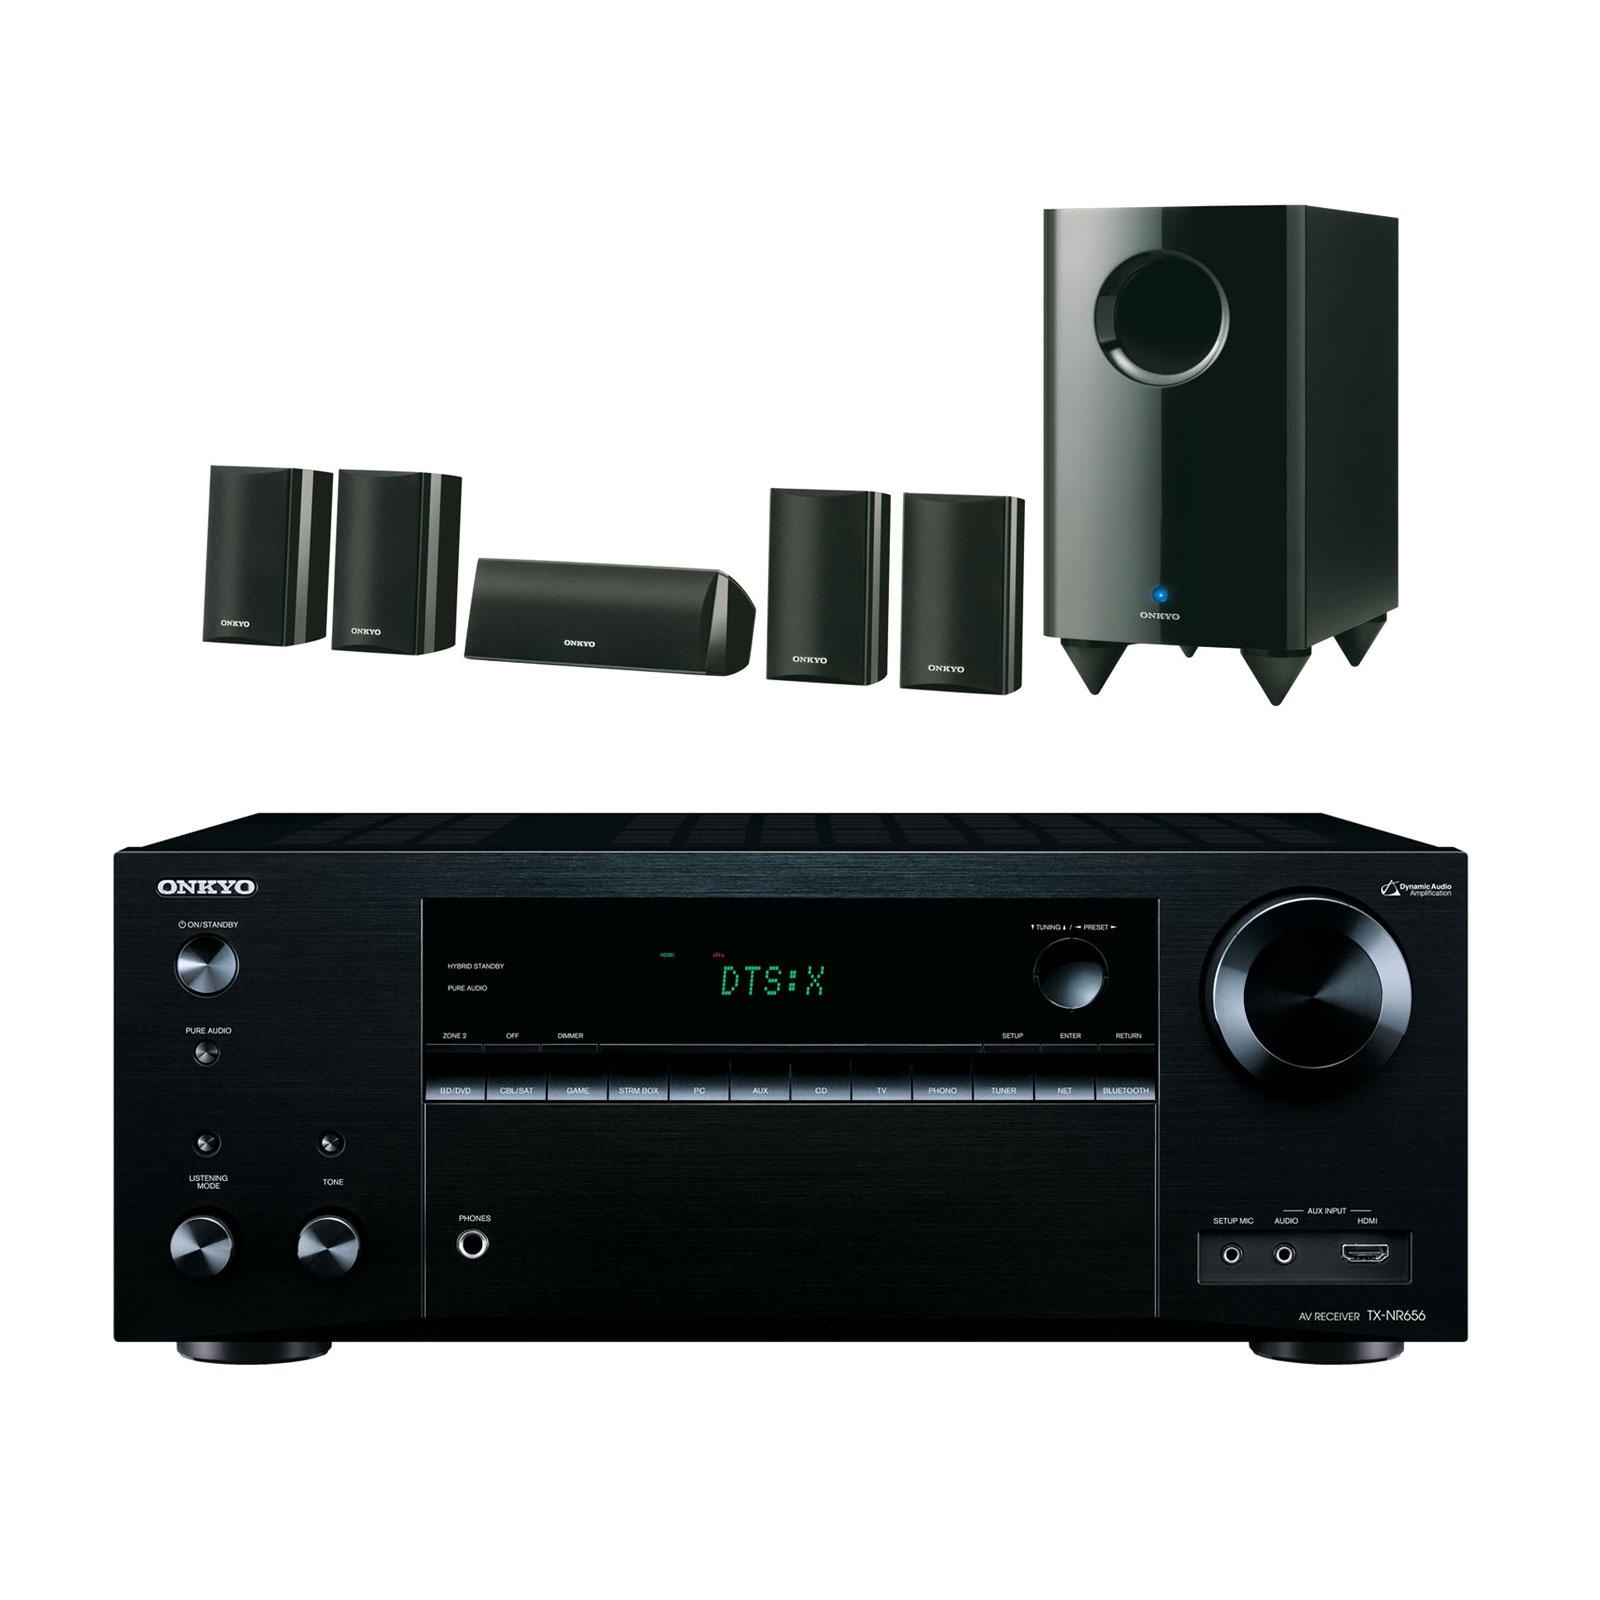 Ensemble home cinéma Onkyo TX-NR656 Noir + SKS-HT528 Ampli-tuner Home Cinéma 7.2 Wi-Fi, Bluetooth, Google Cast, AirPlay avec HDMI 4K/HDCP 2.2, DAC AKM, Dolby Atmos et DTS:X + Pack d'enceintes 5.1